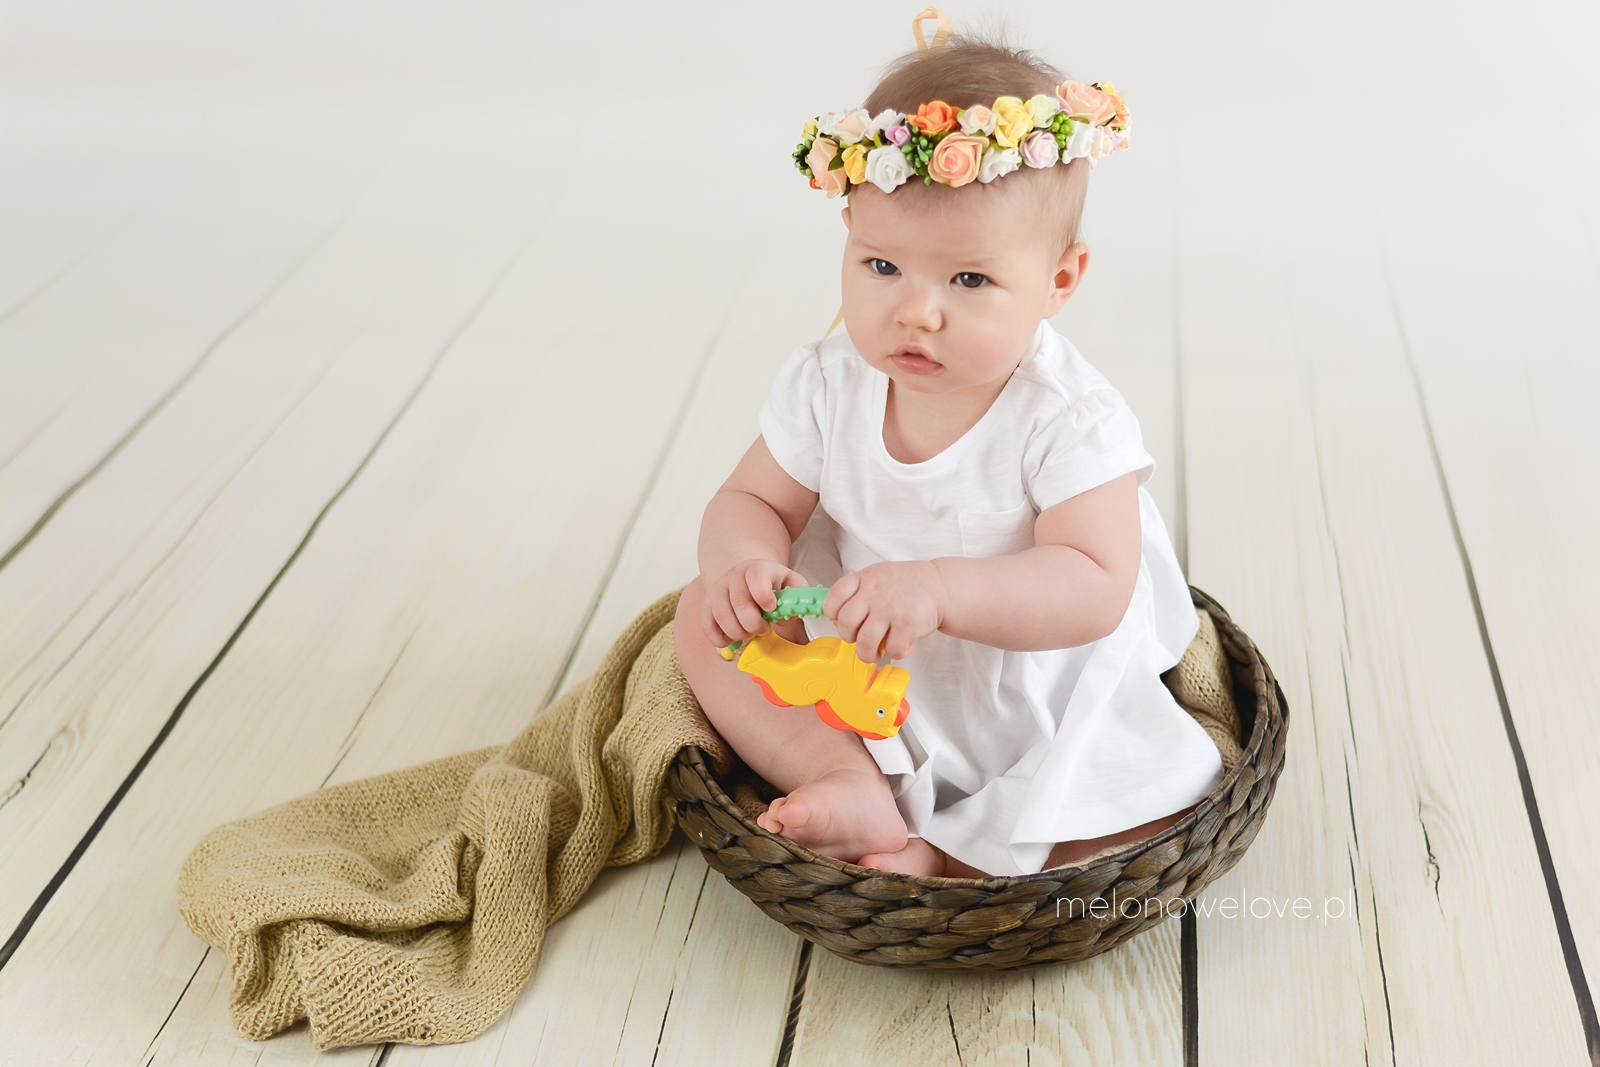 sesja niemowlęca 8 miesięcy